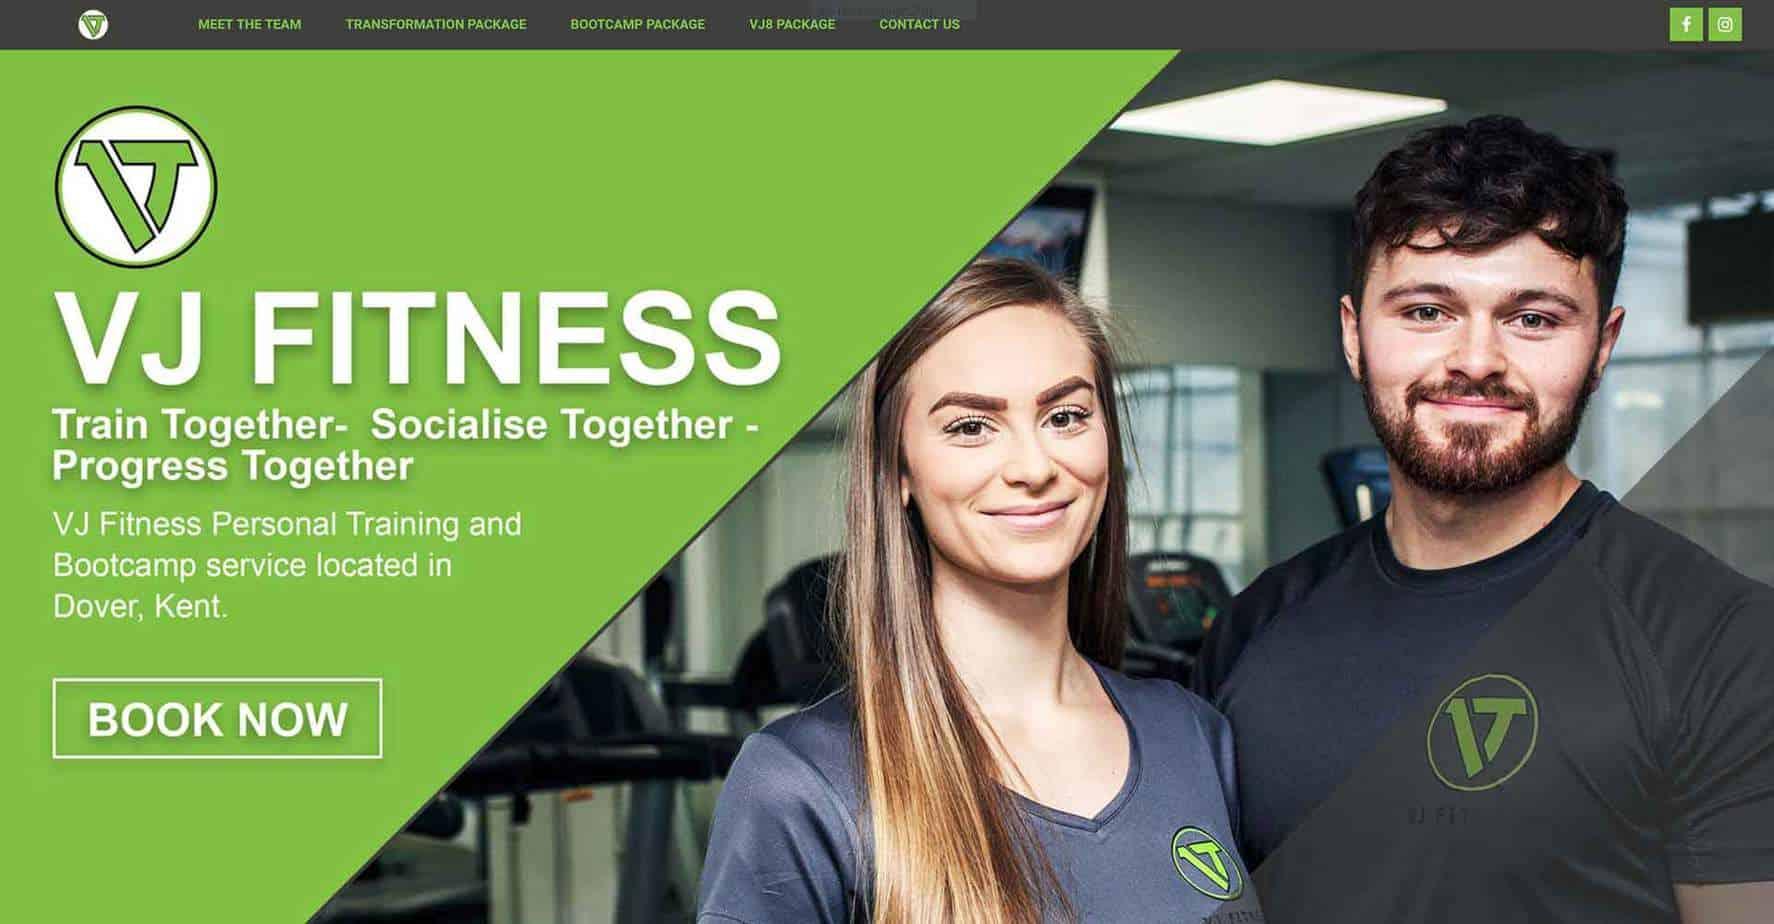 Gym website design ideas by Blue Orbit Web Design